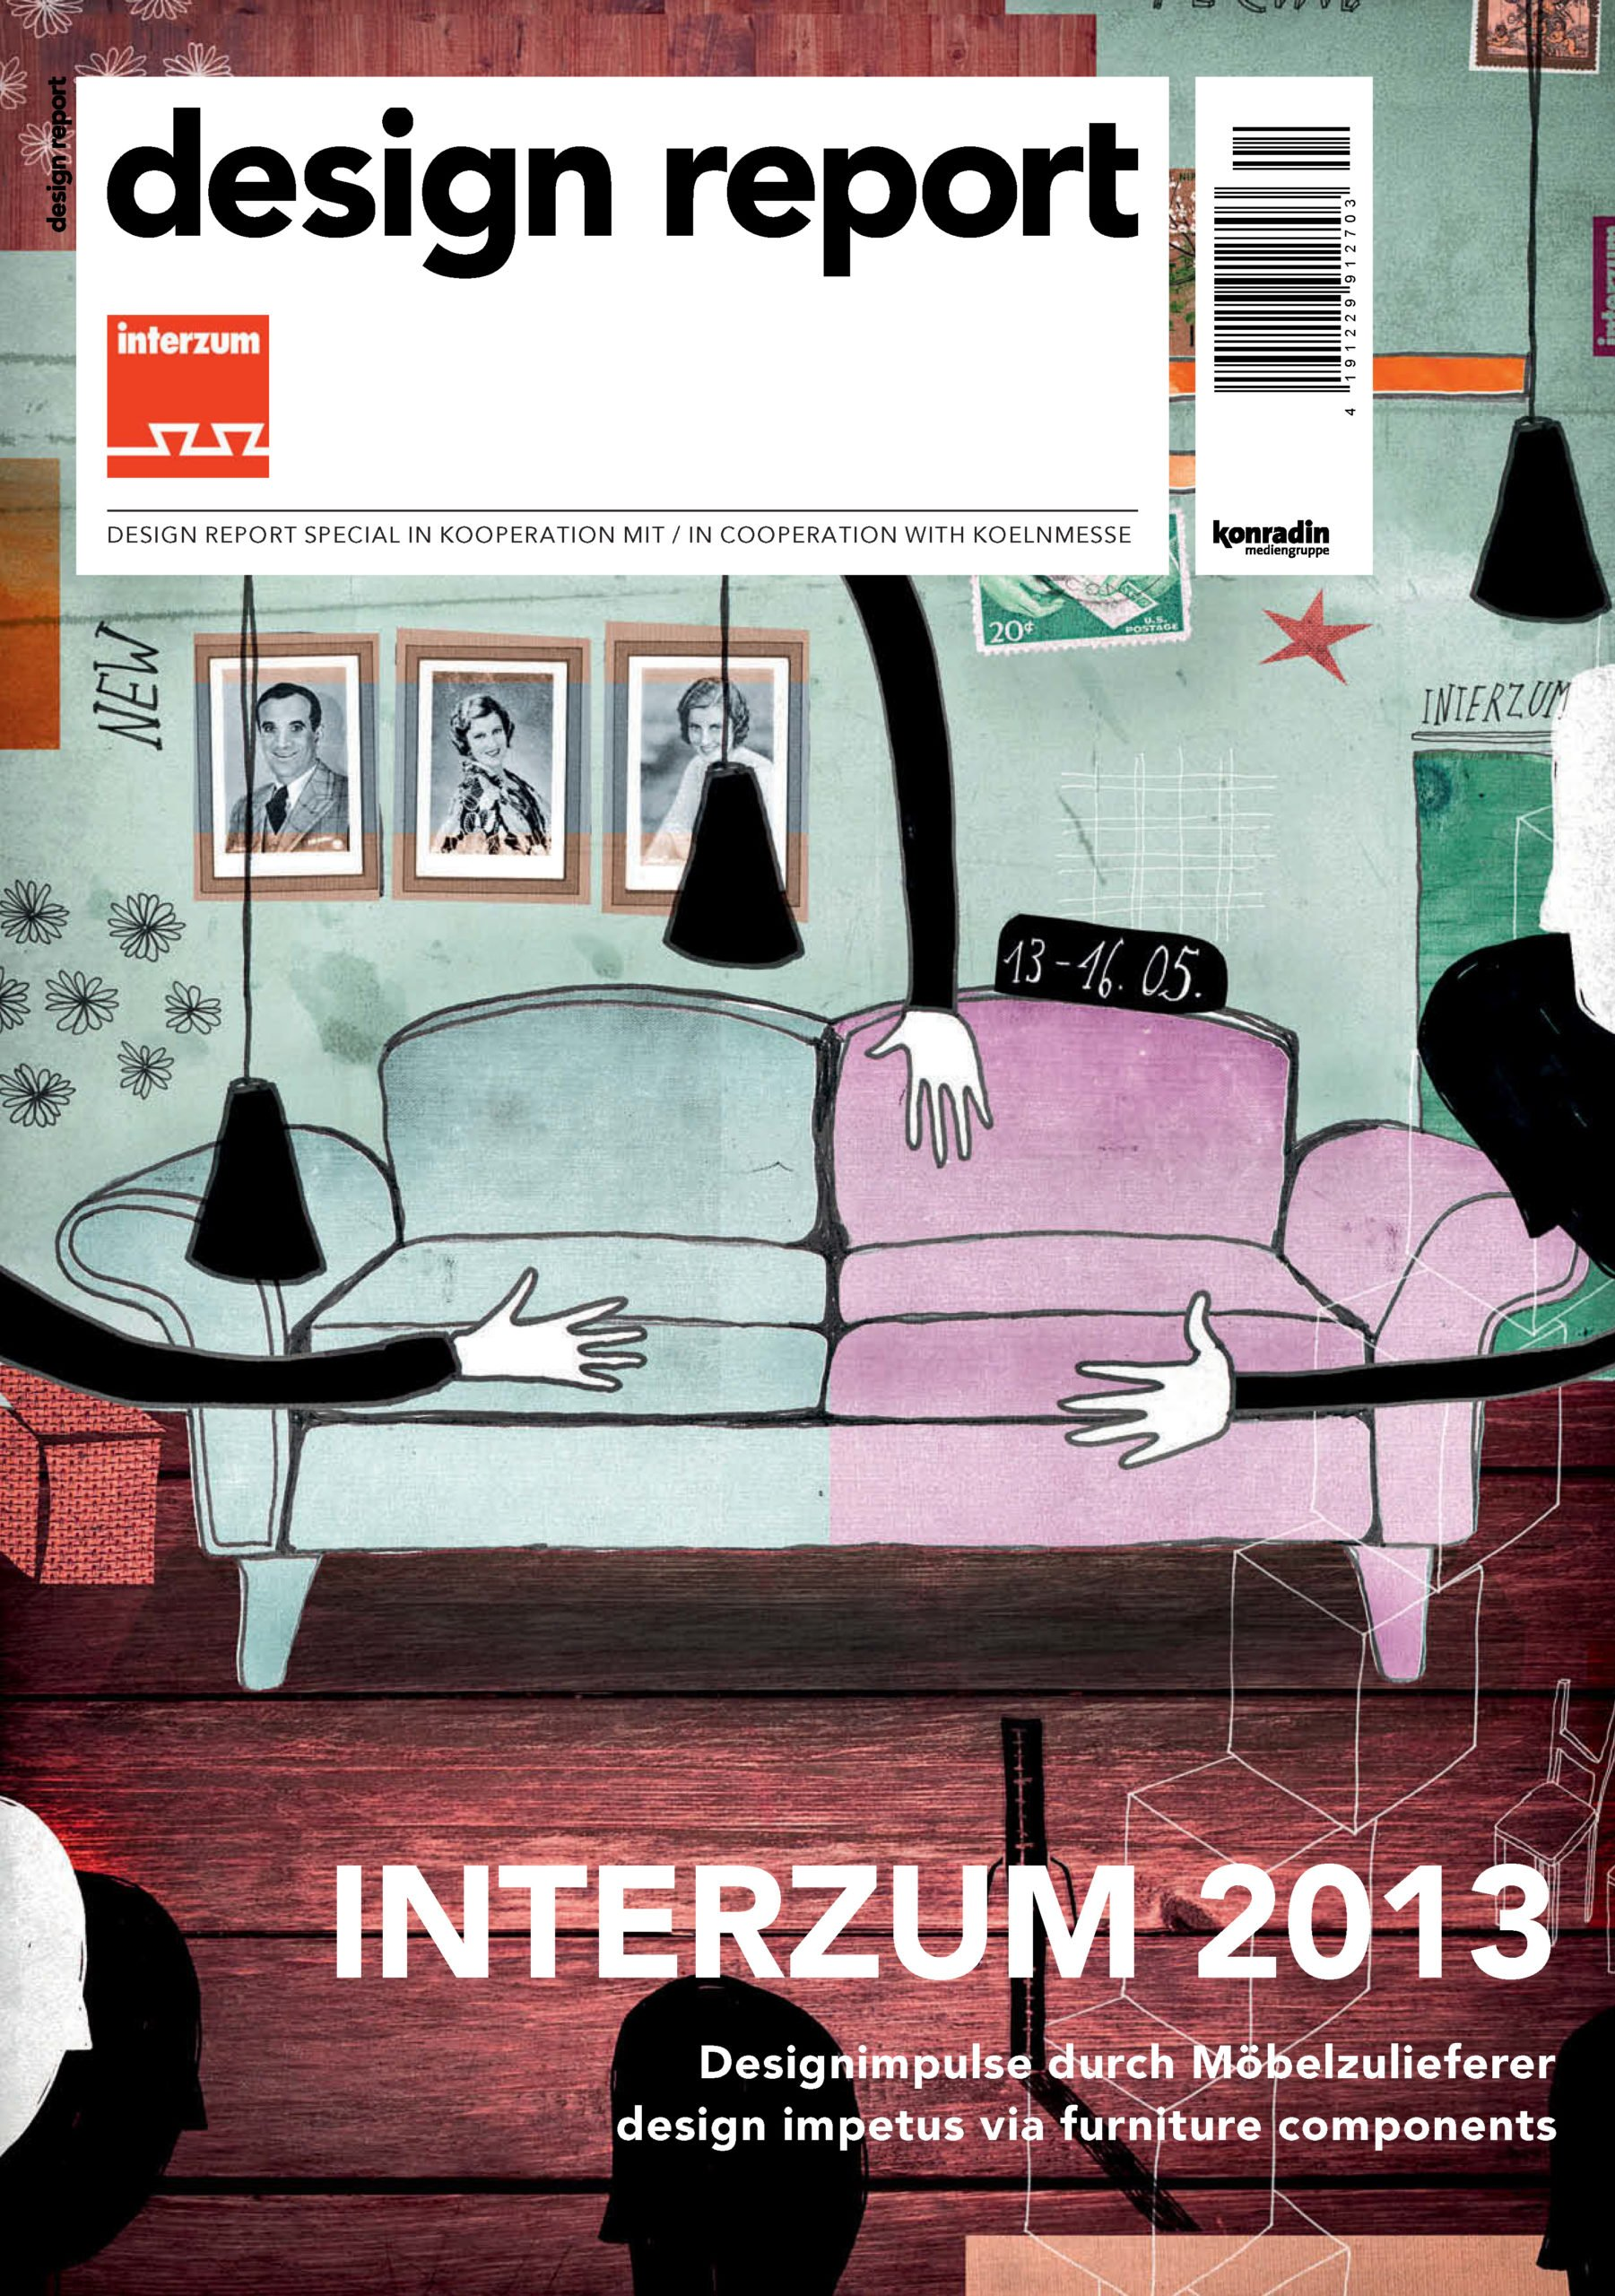 https://farconsulting.de/wp-content/uploads/2013/05/designreport_interzum2013_Seite_01-1-scaled.jpg